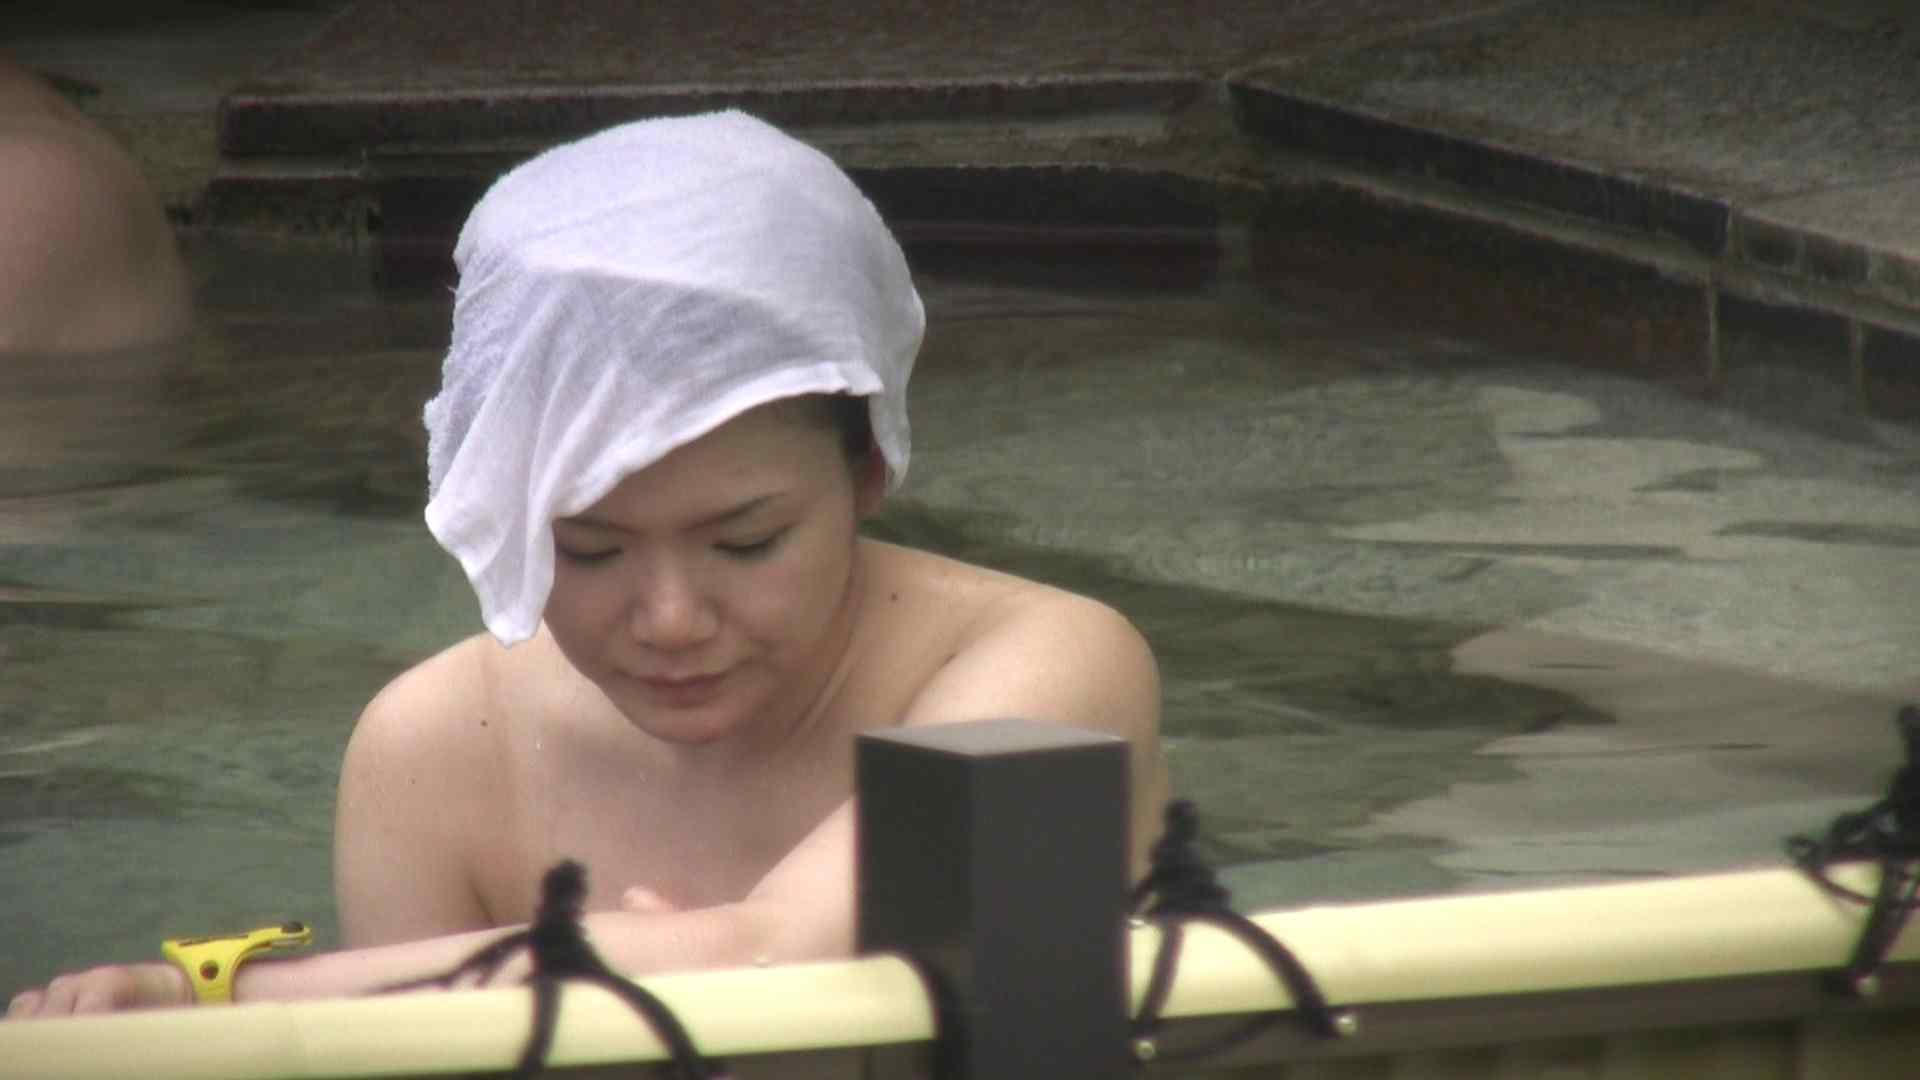 Aquaな露天風呂Vol.12【VIP】 HなOL | 盗撮  83pic 44